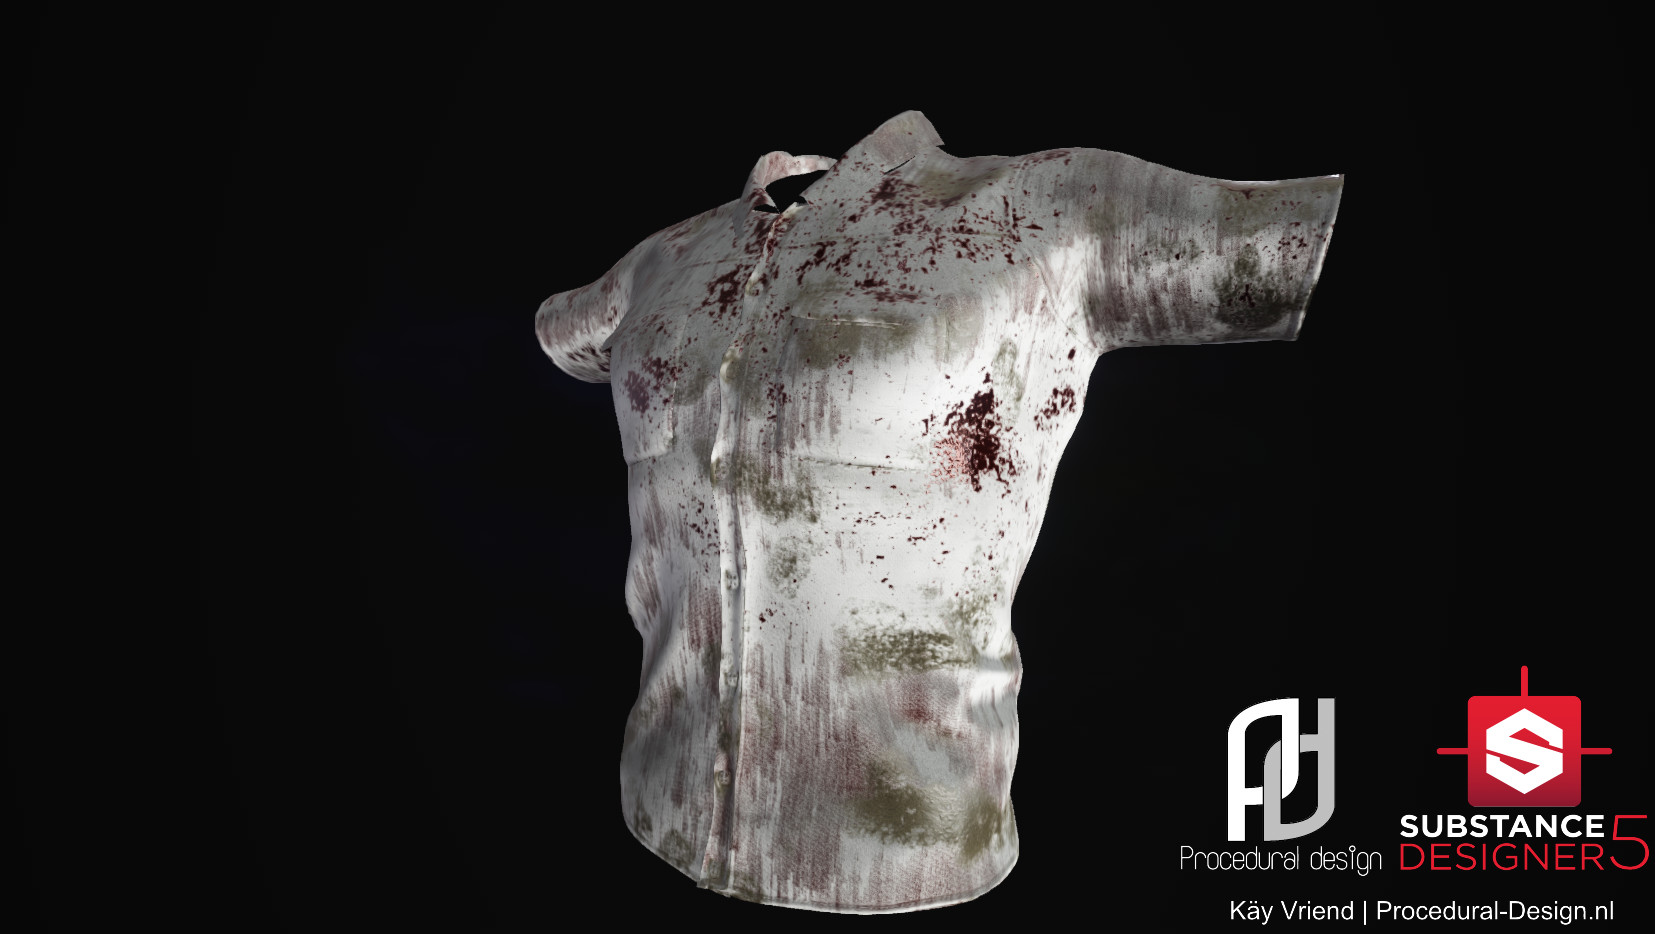 Kay vriend zombie 13